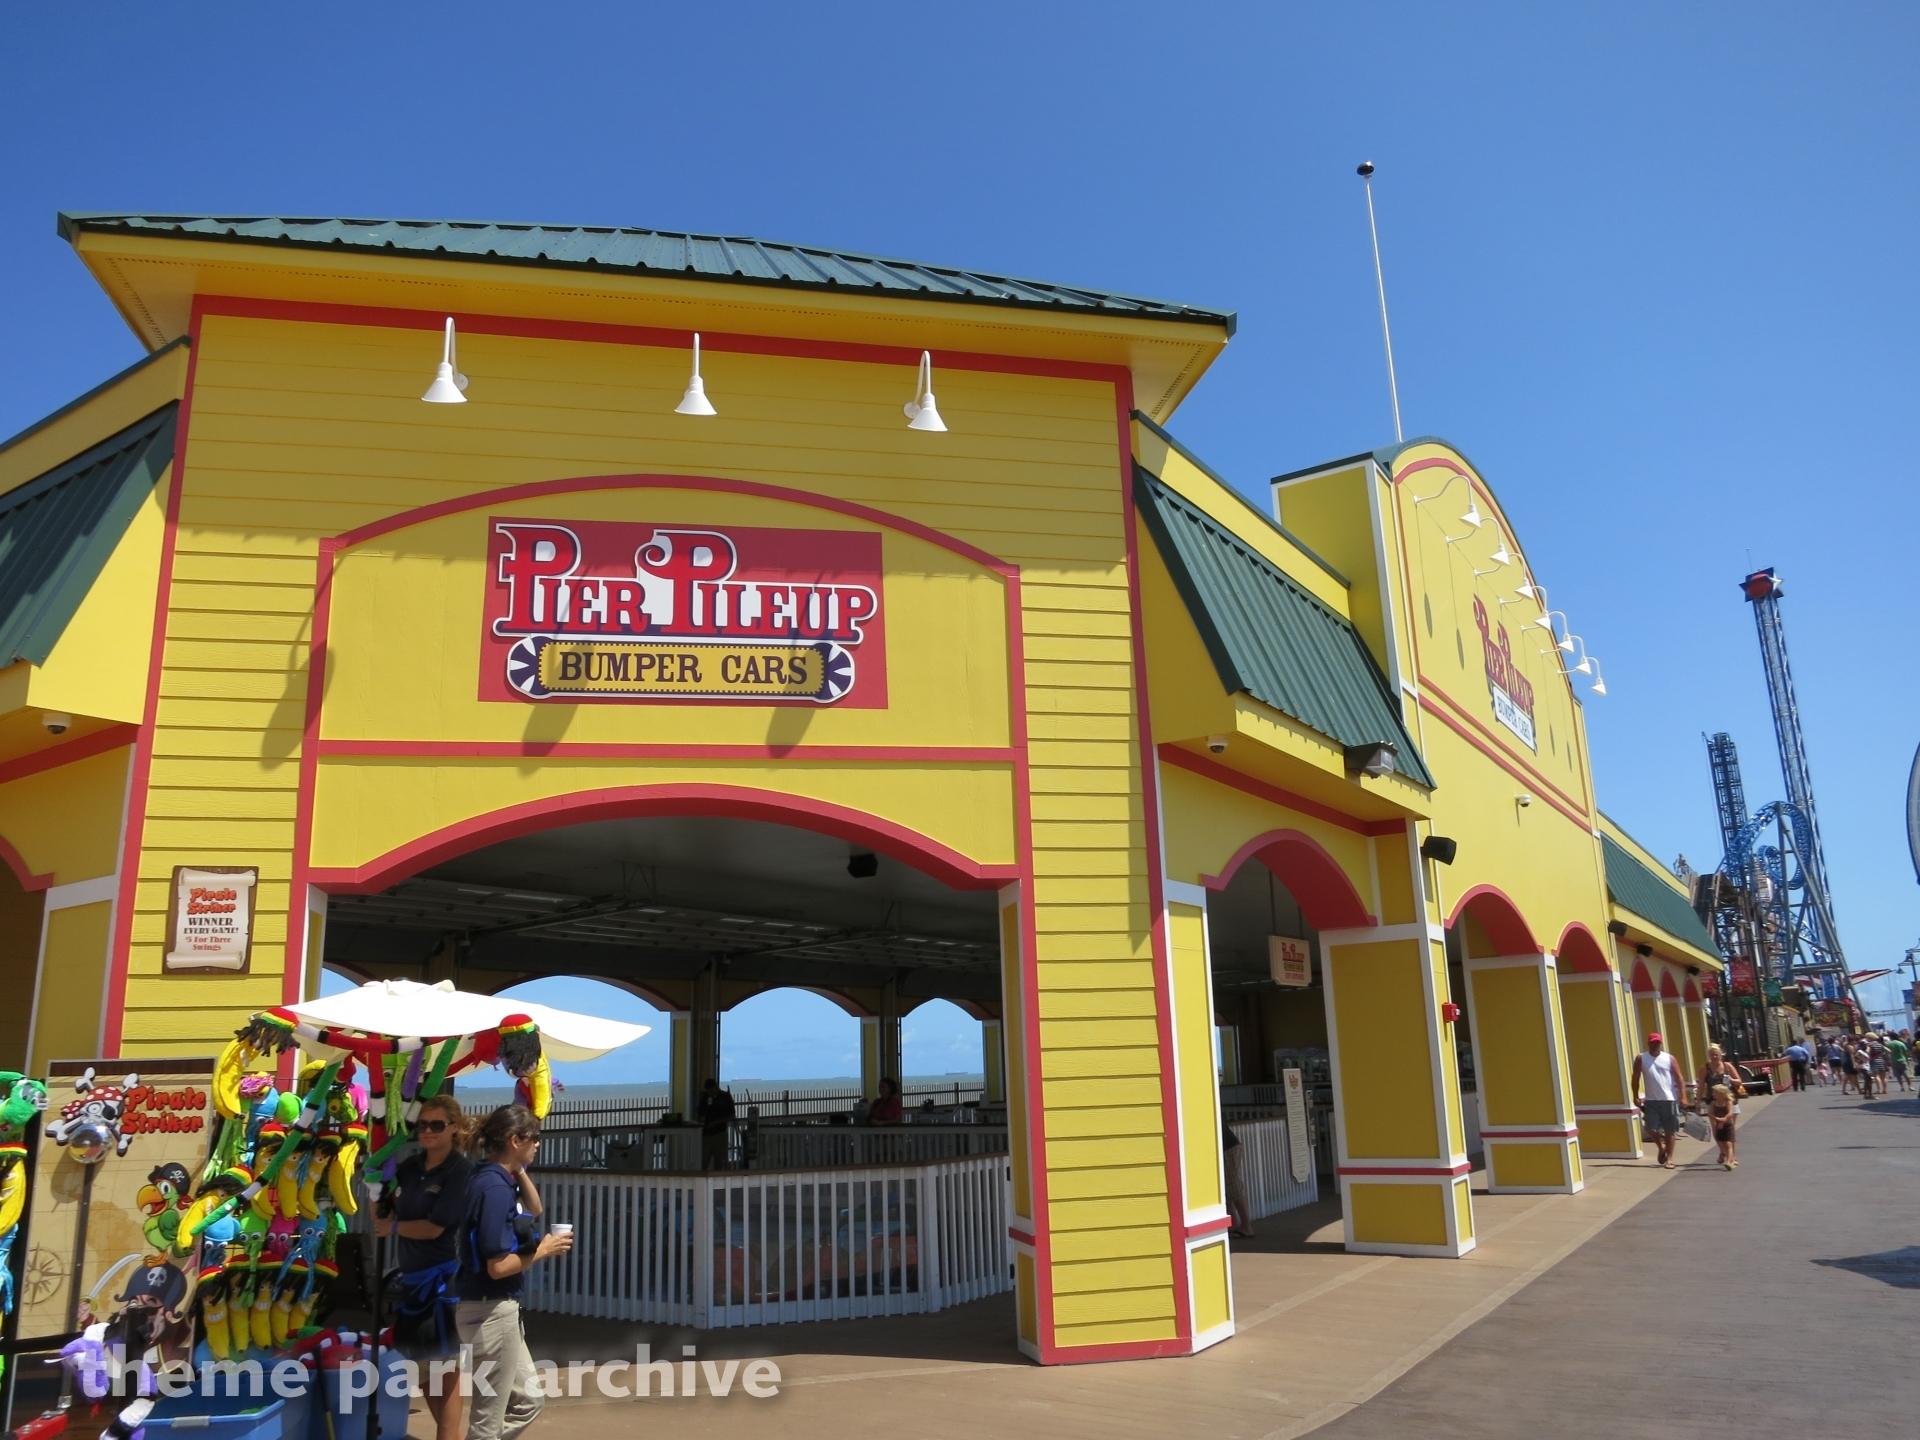 Pier PIleup Bumper Cars at Galveston Island Historic Pleasure Pier